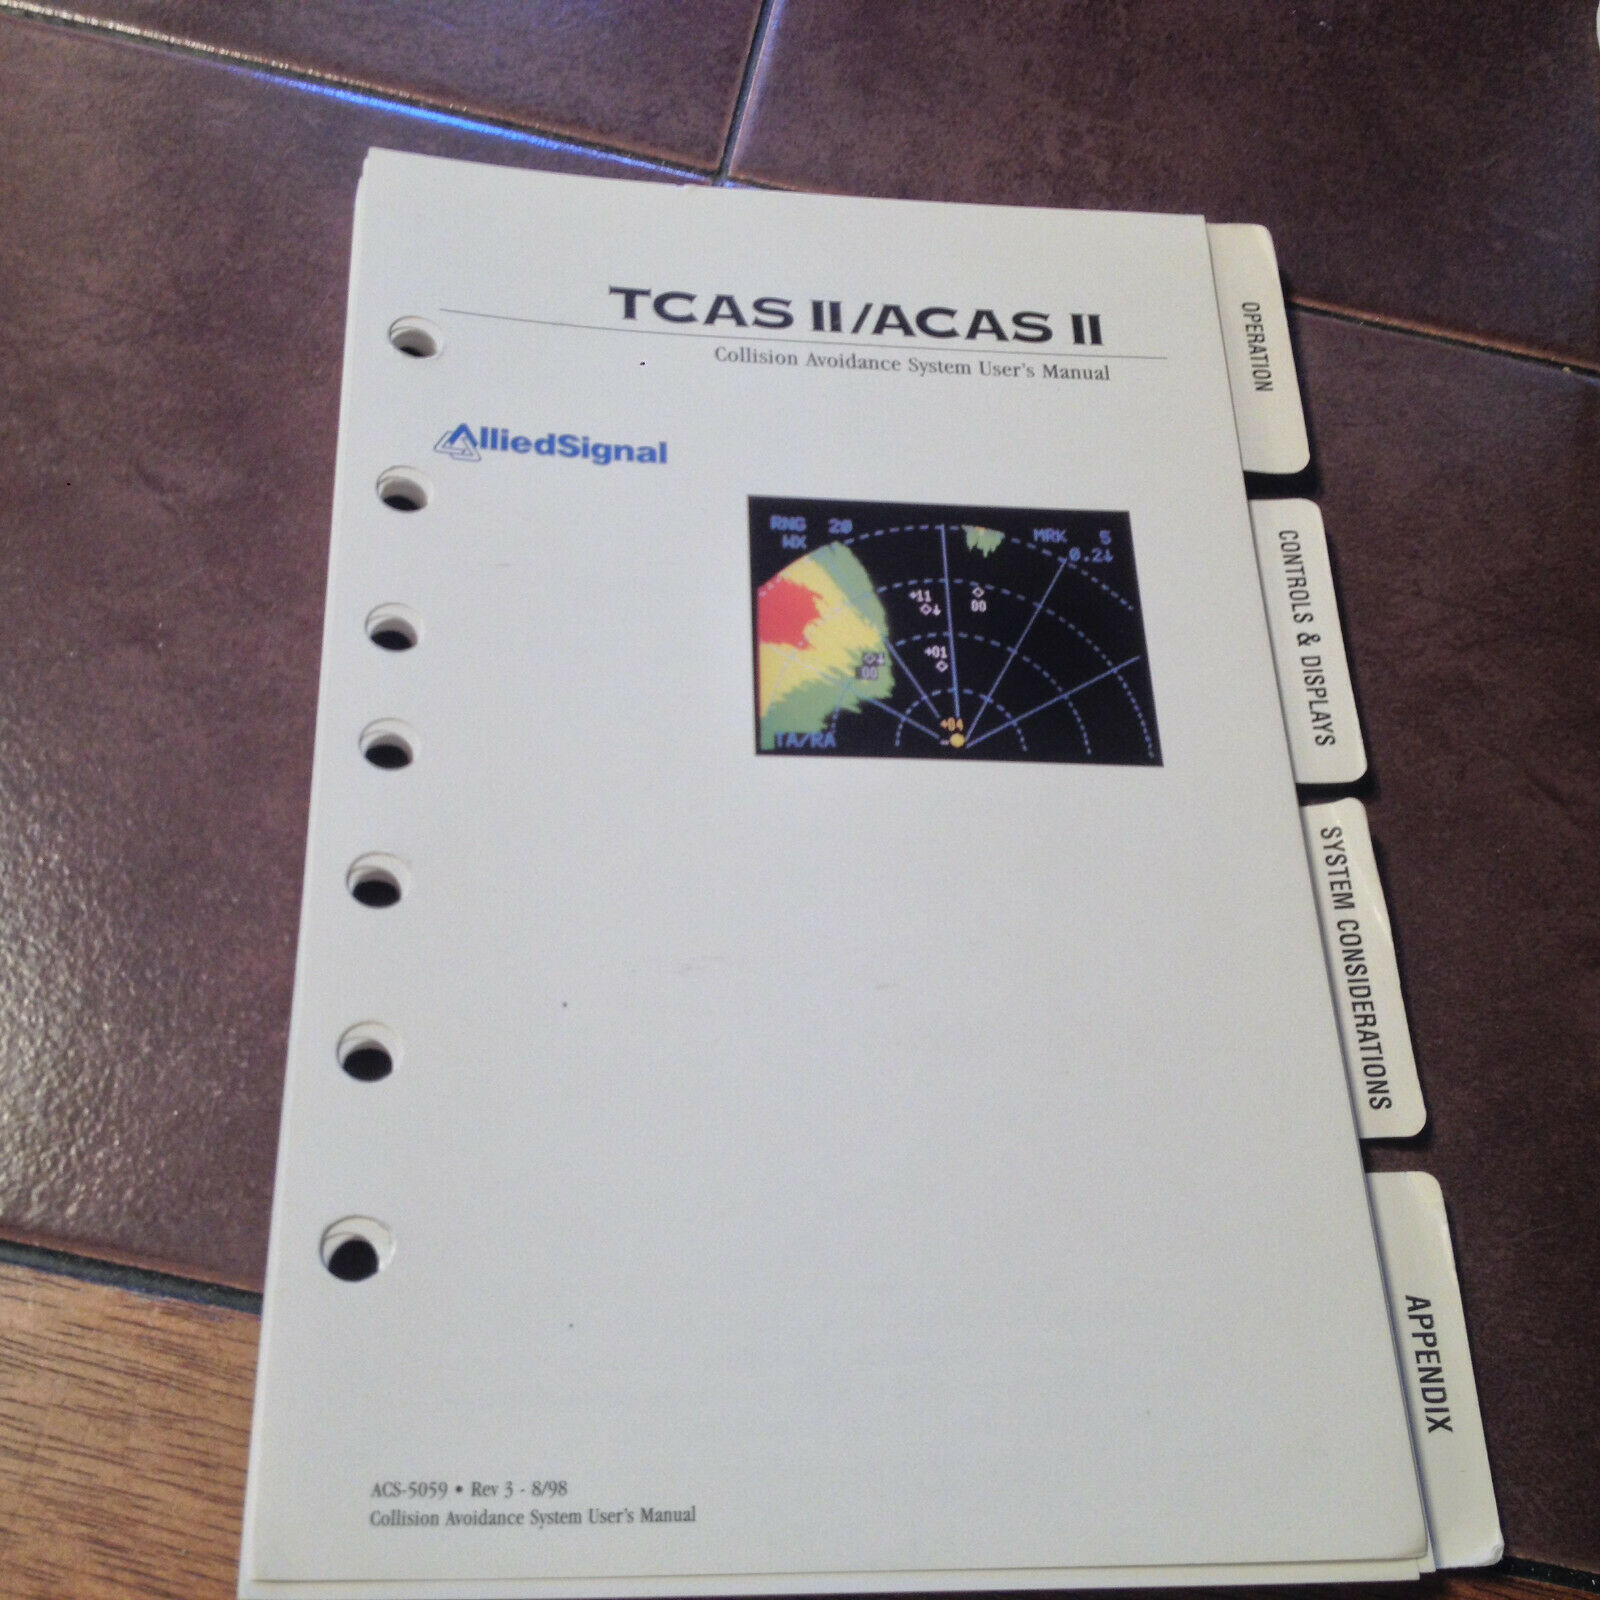 AlliedSignal TCAS II & ACAS II Pilot's Guide